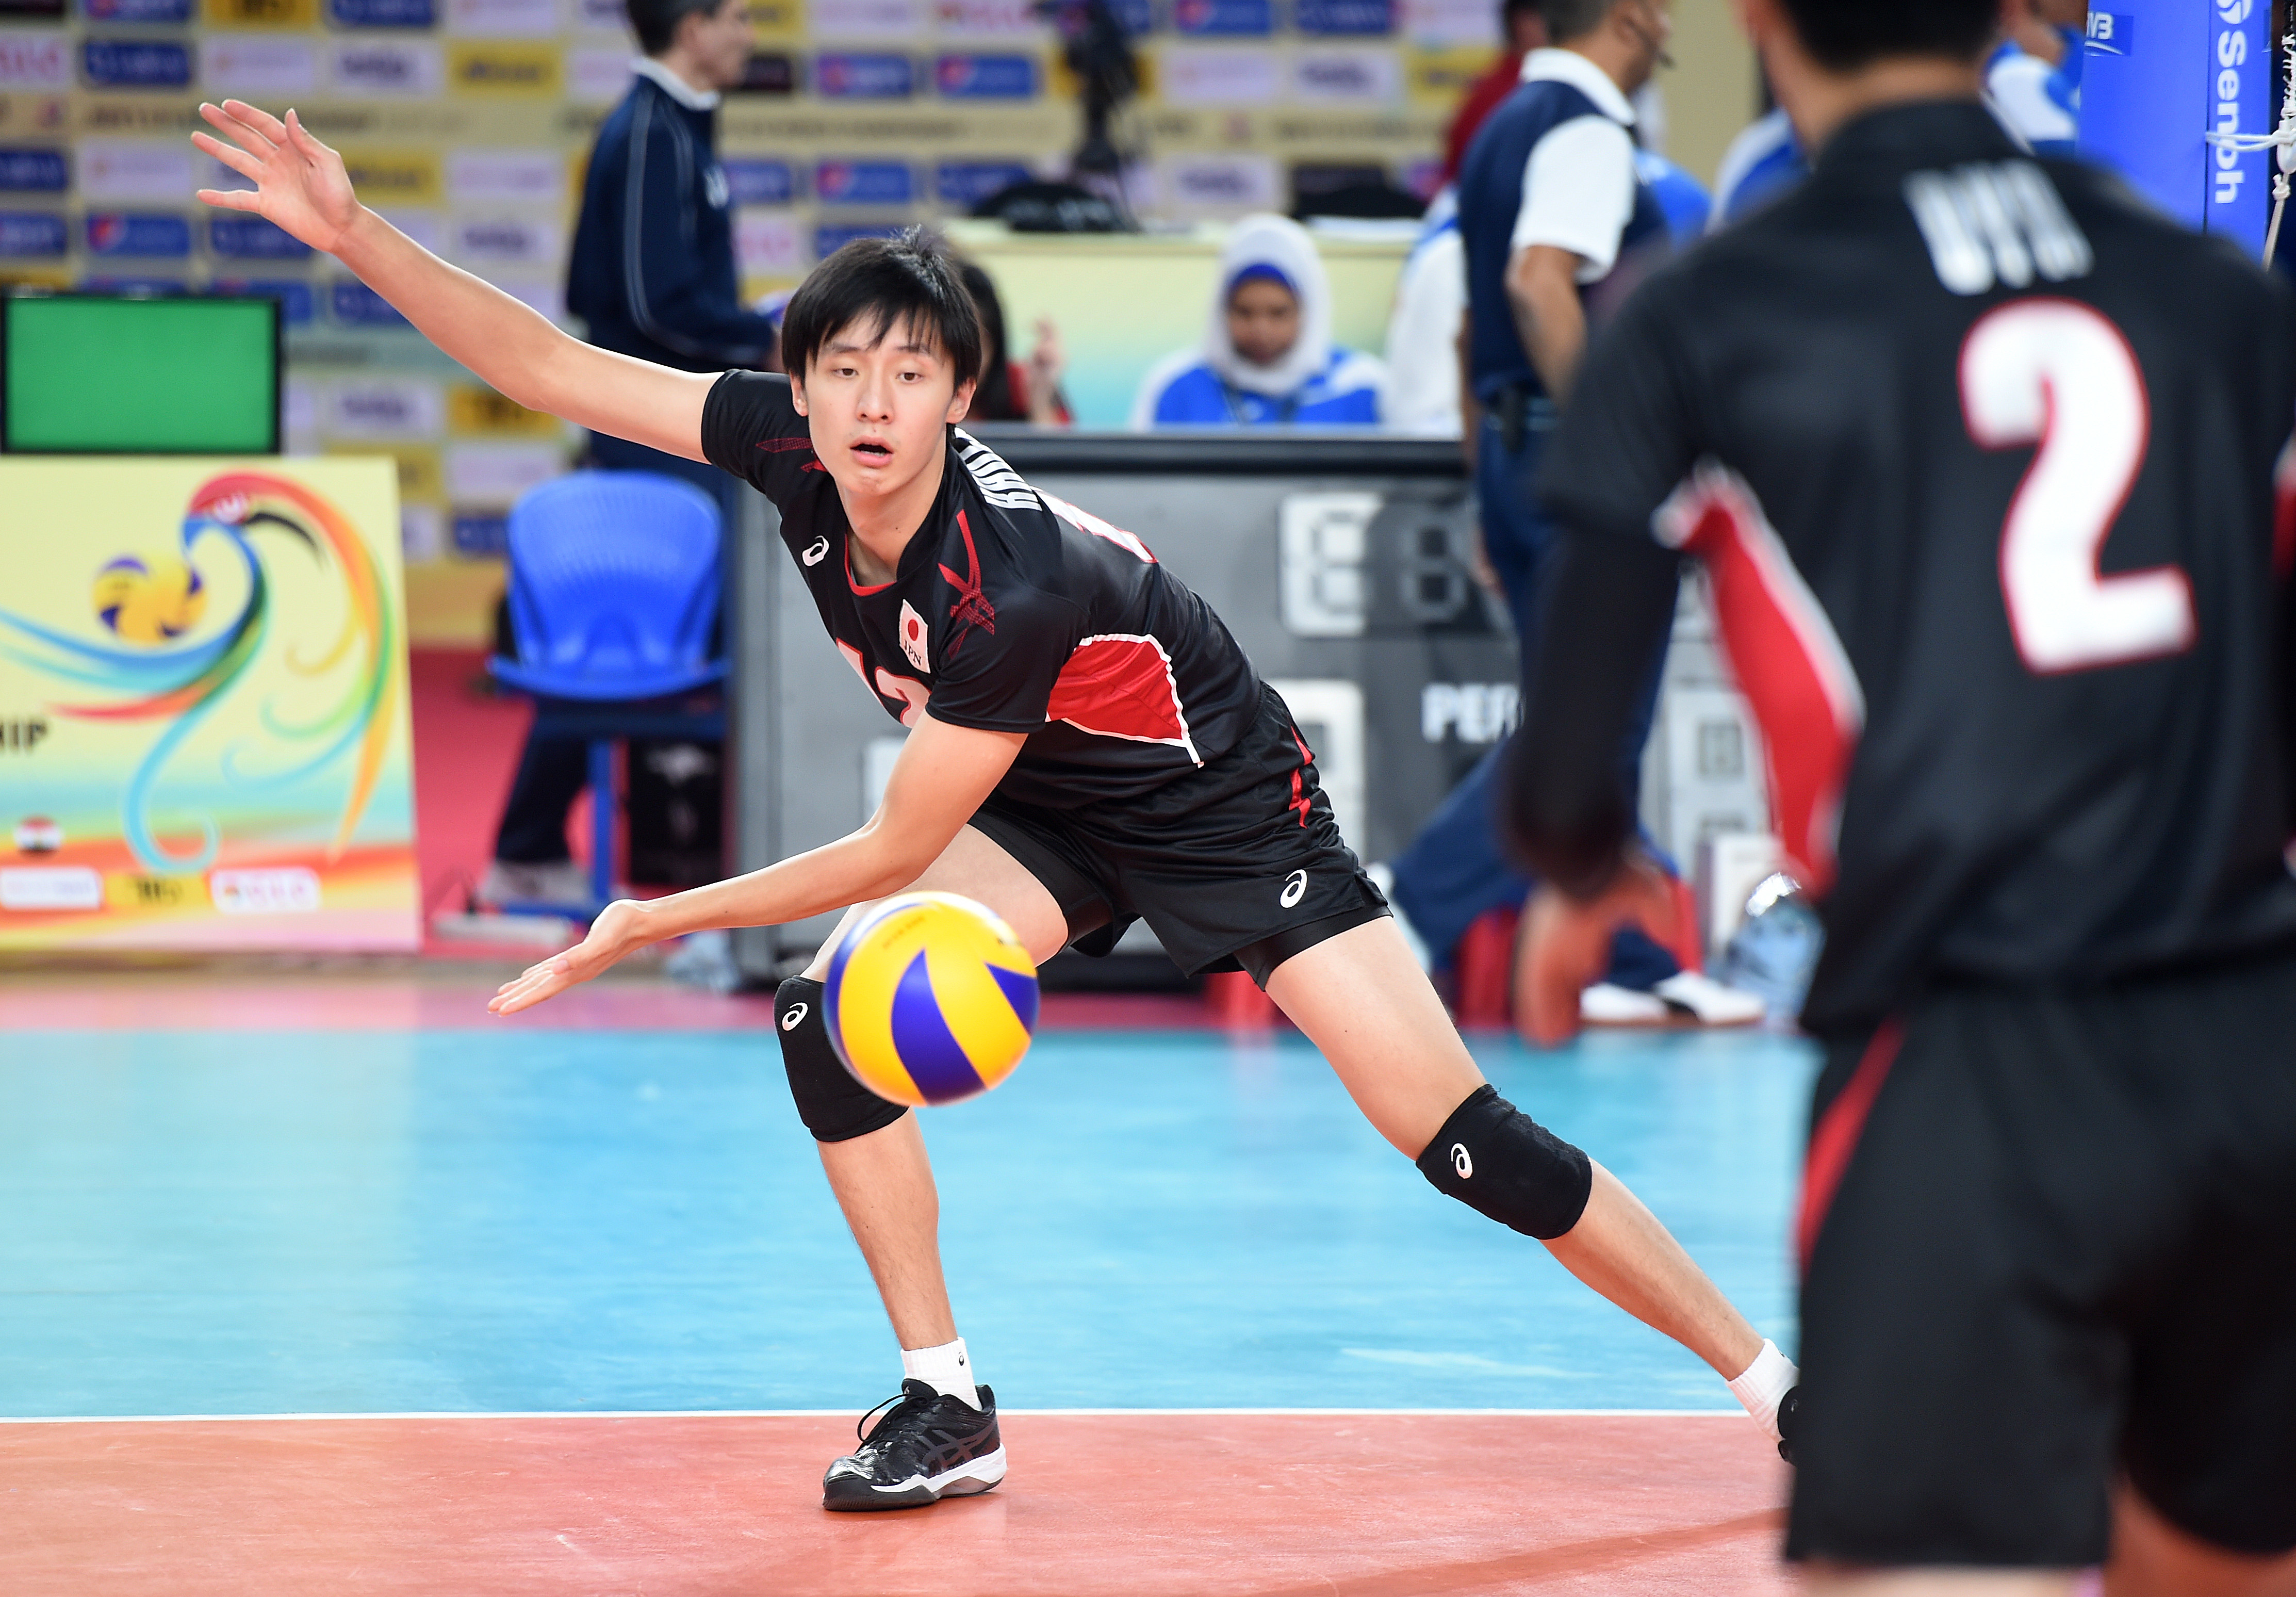 Overview Japan Fivb Volleyball Boys U19 World Championship 2017